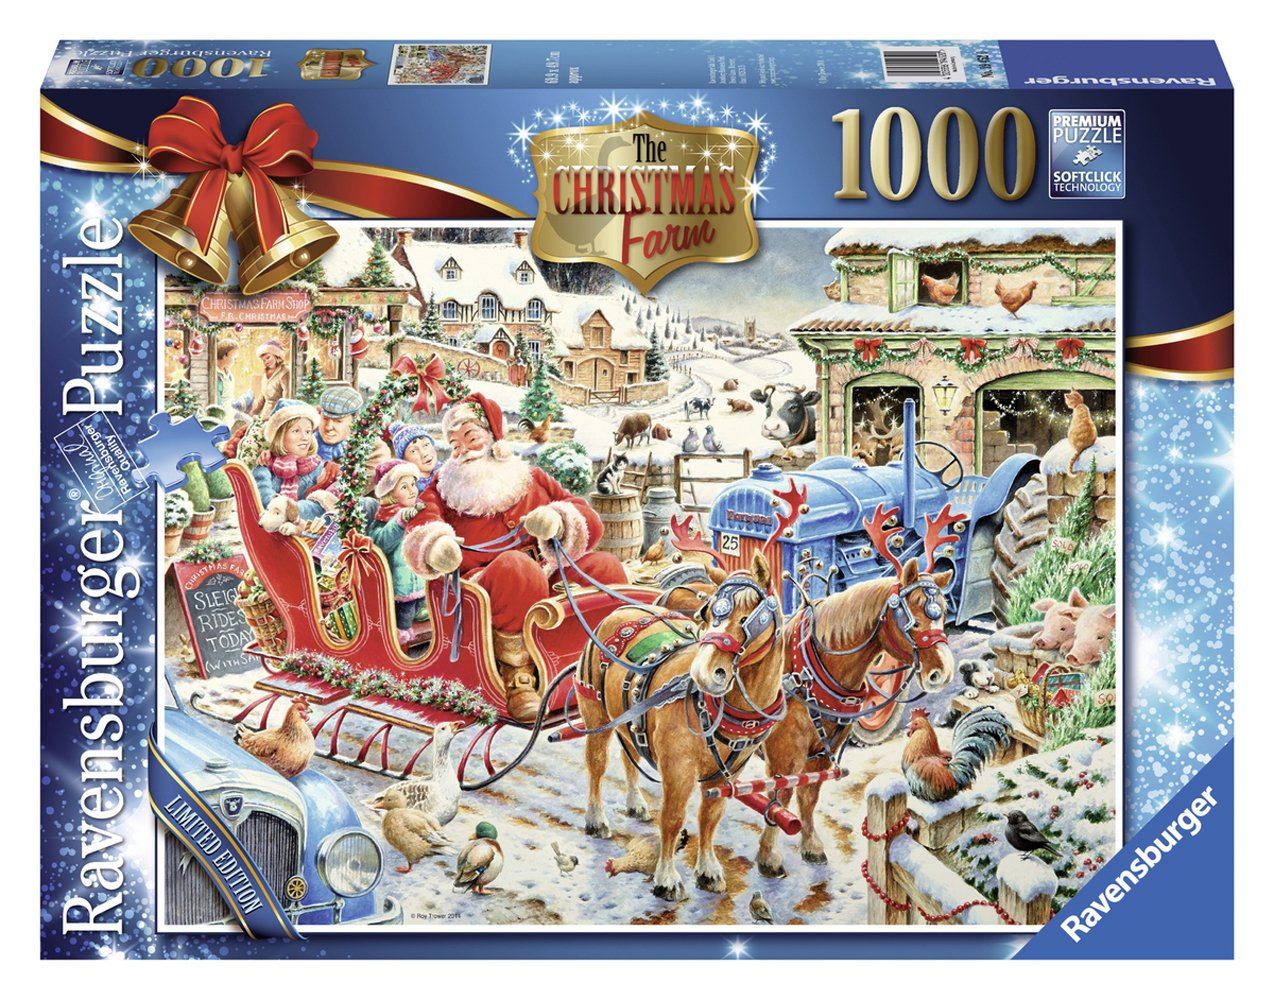 amazoncom ravensburger christmas 2014 limited edition puzzle the christmas farm 1000 toys games - Ravensburger Christmas Puzzles